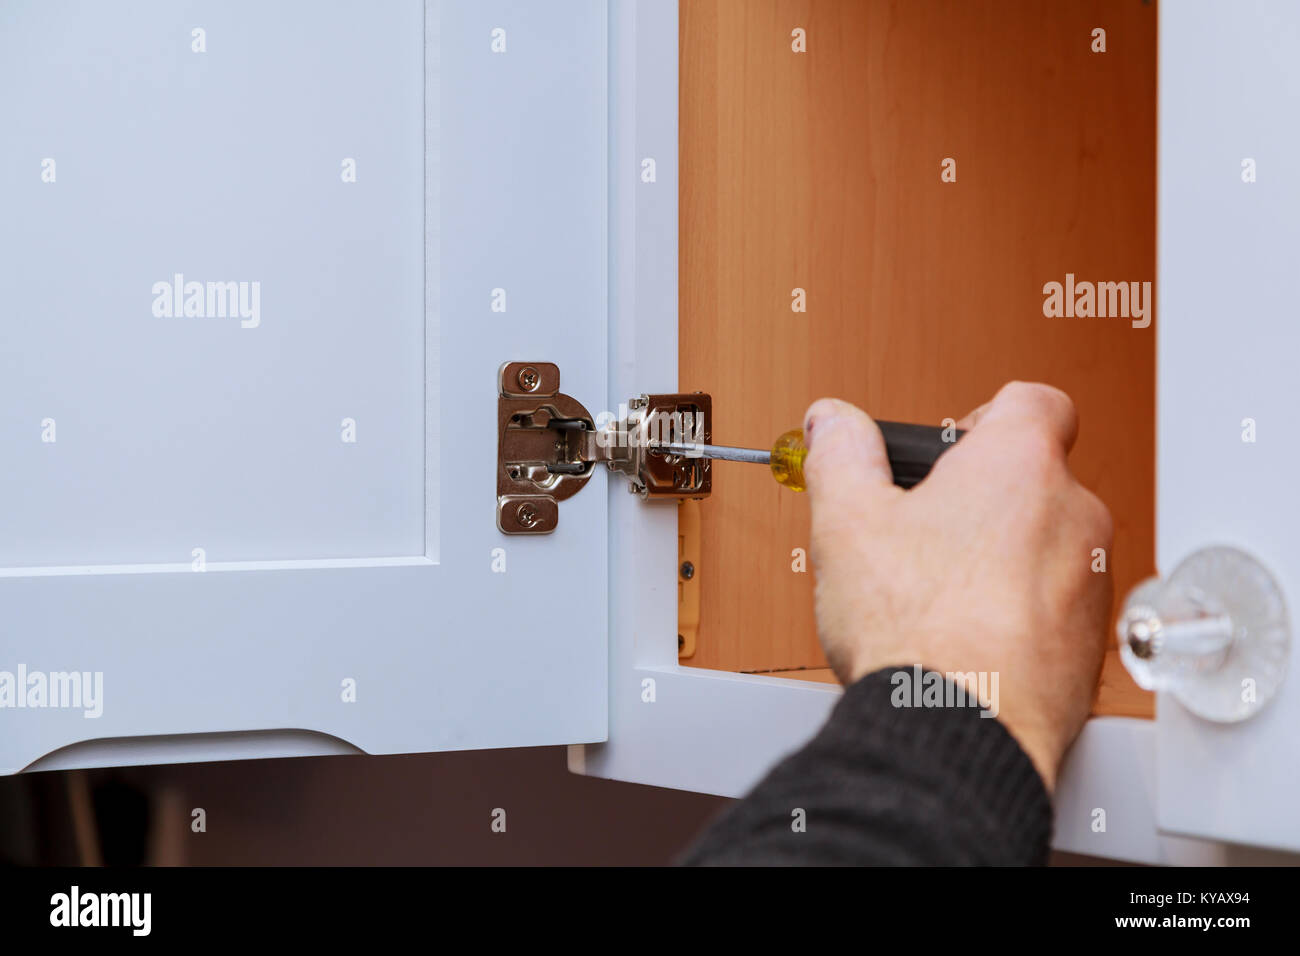 Adjusting Fixing Cabinet Door Hinge Adjustment On Kitchen Cabinets Stock Photo Alamy